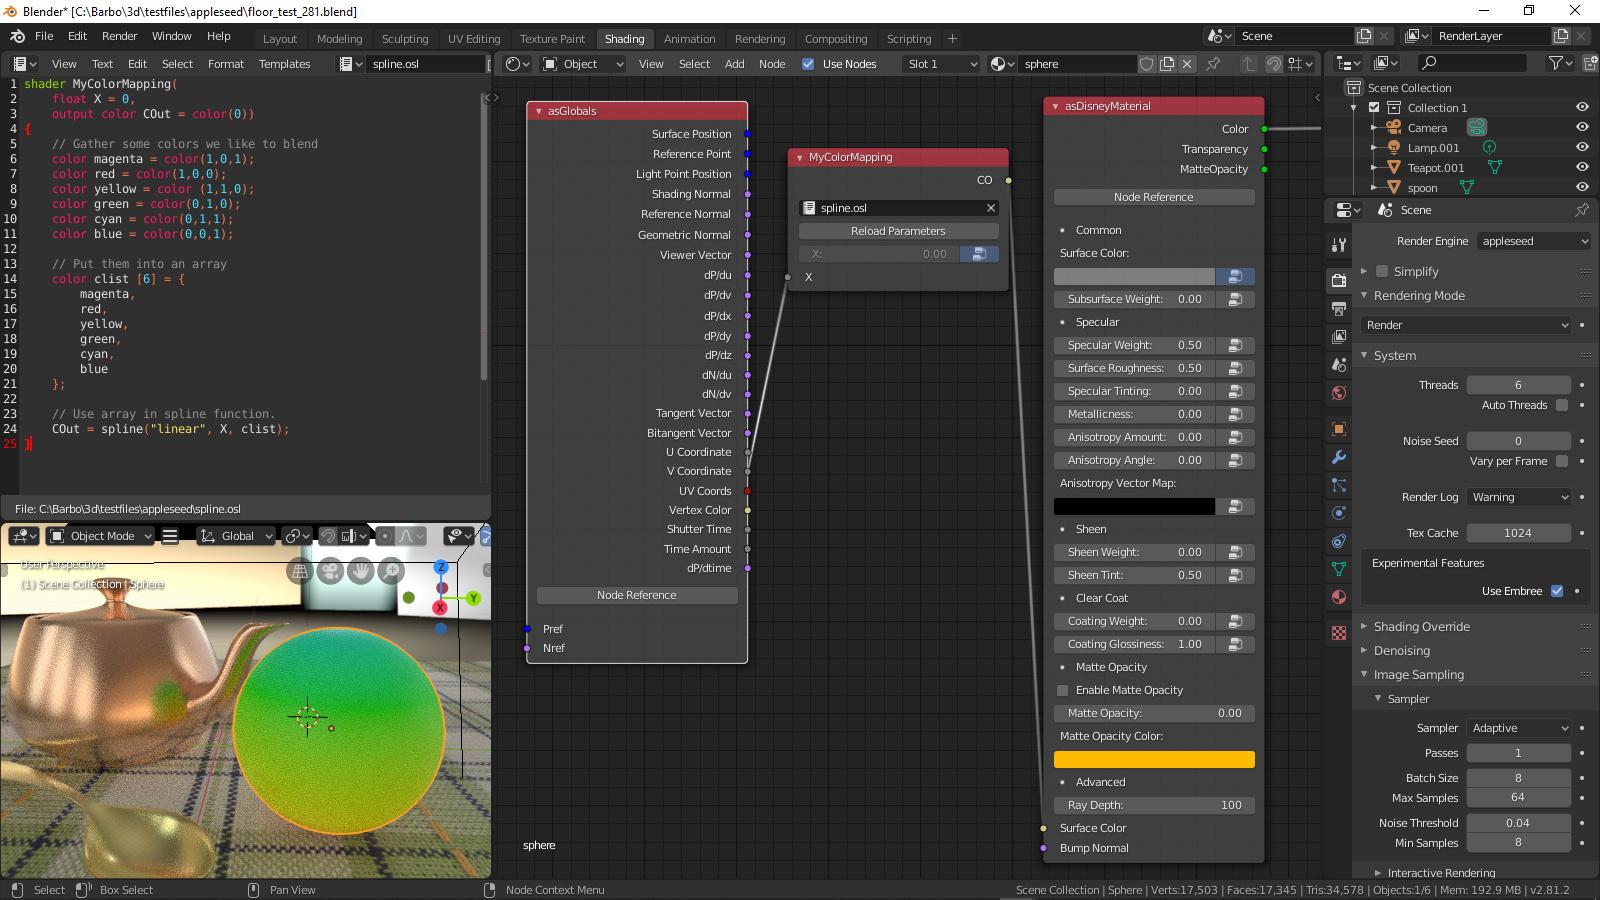 Manipulating UV's in Blender, tiled textures & OSL script